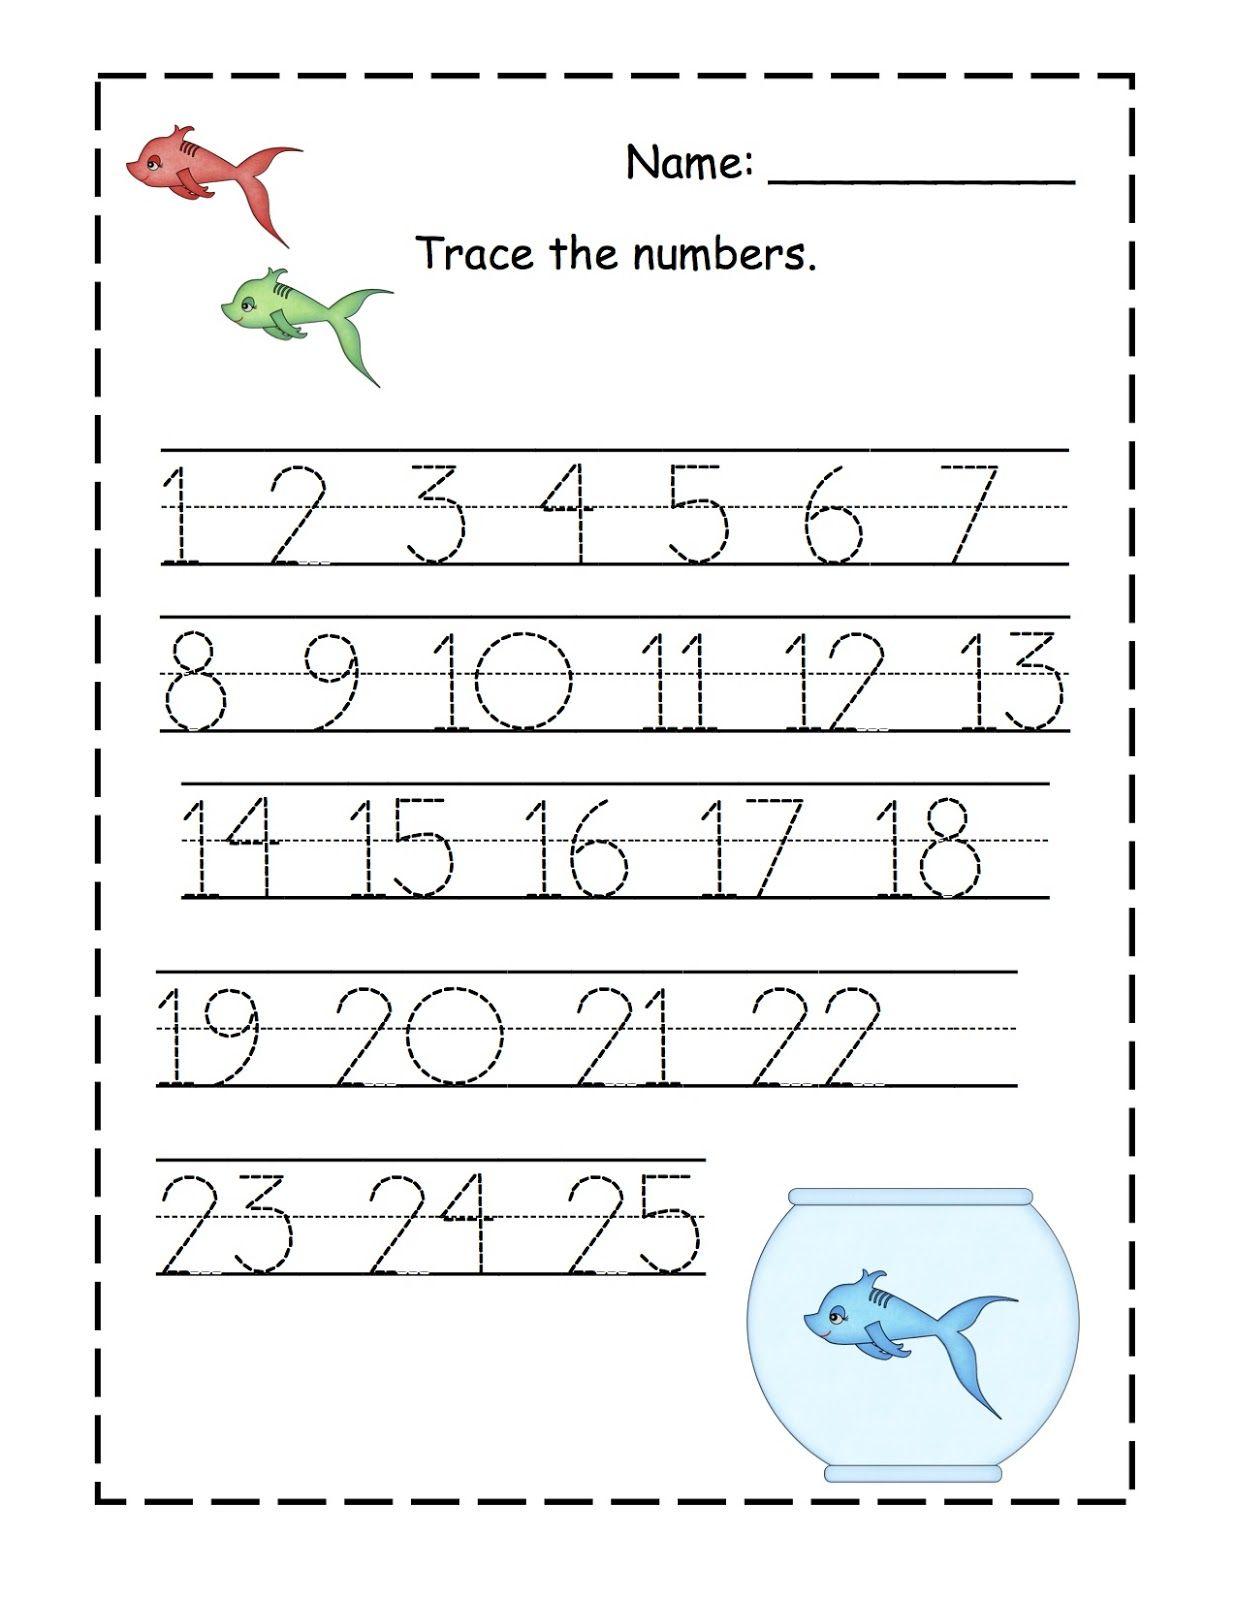 Traceable Numbers 1-10 For Kindergarten Kids. | Kiddo Shelter ...